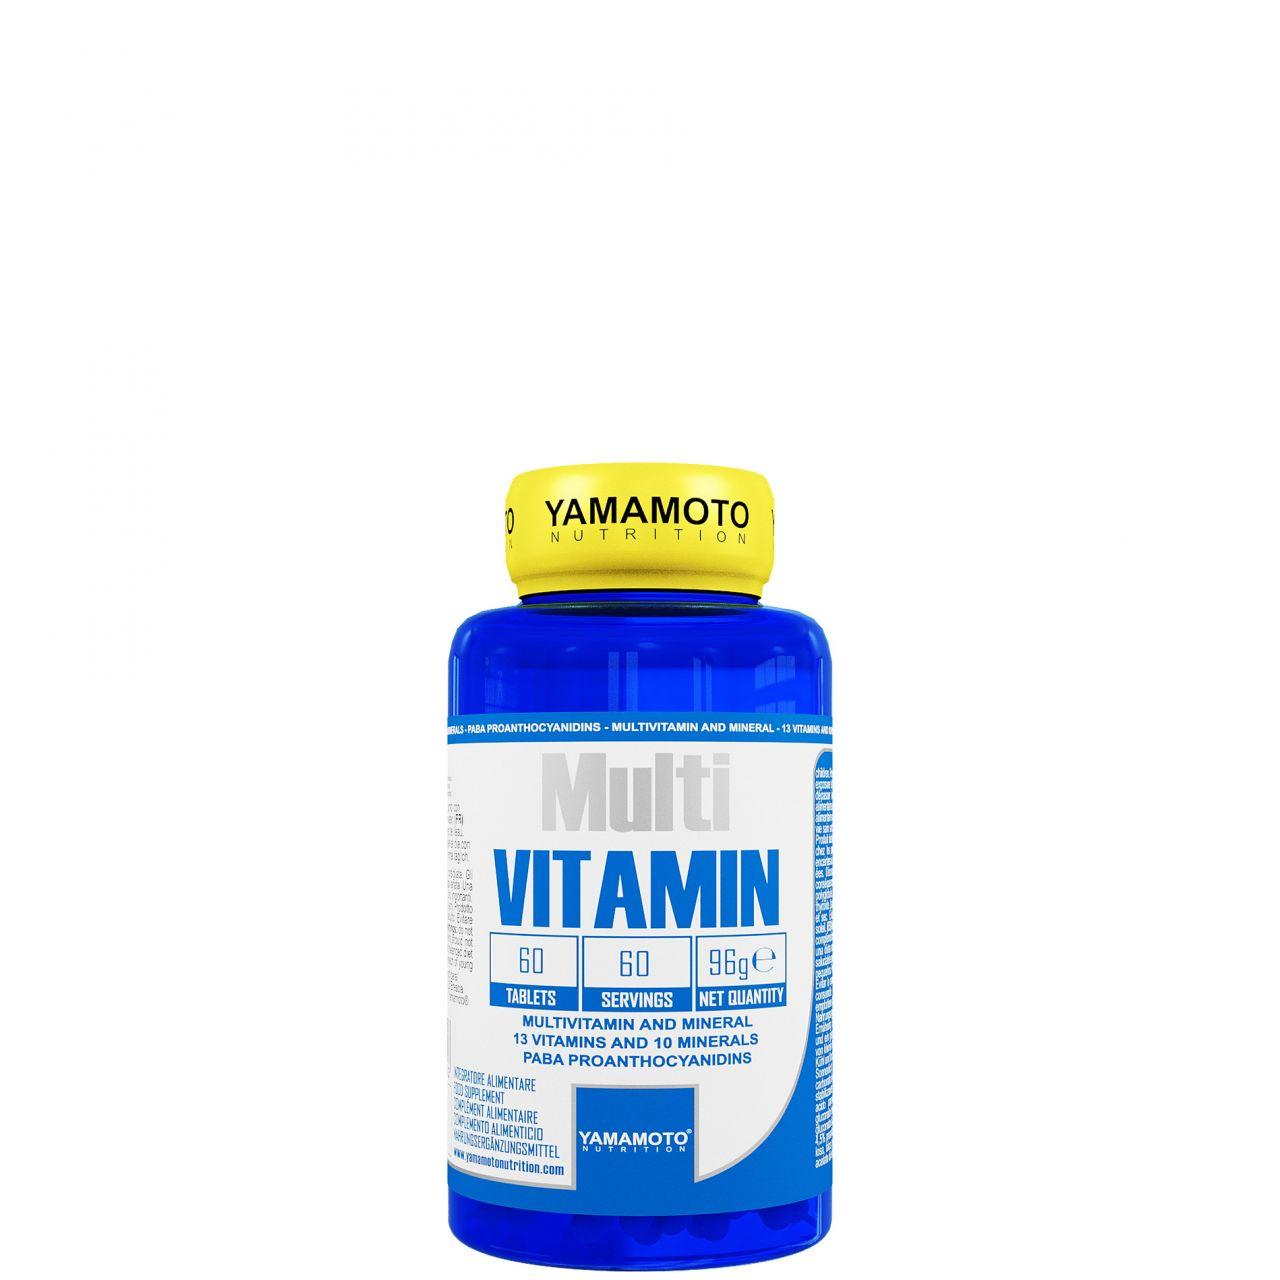 YAMAMOTO NUTRITION - MULTI VITAMIN - 60 TABLETTA